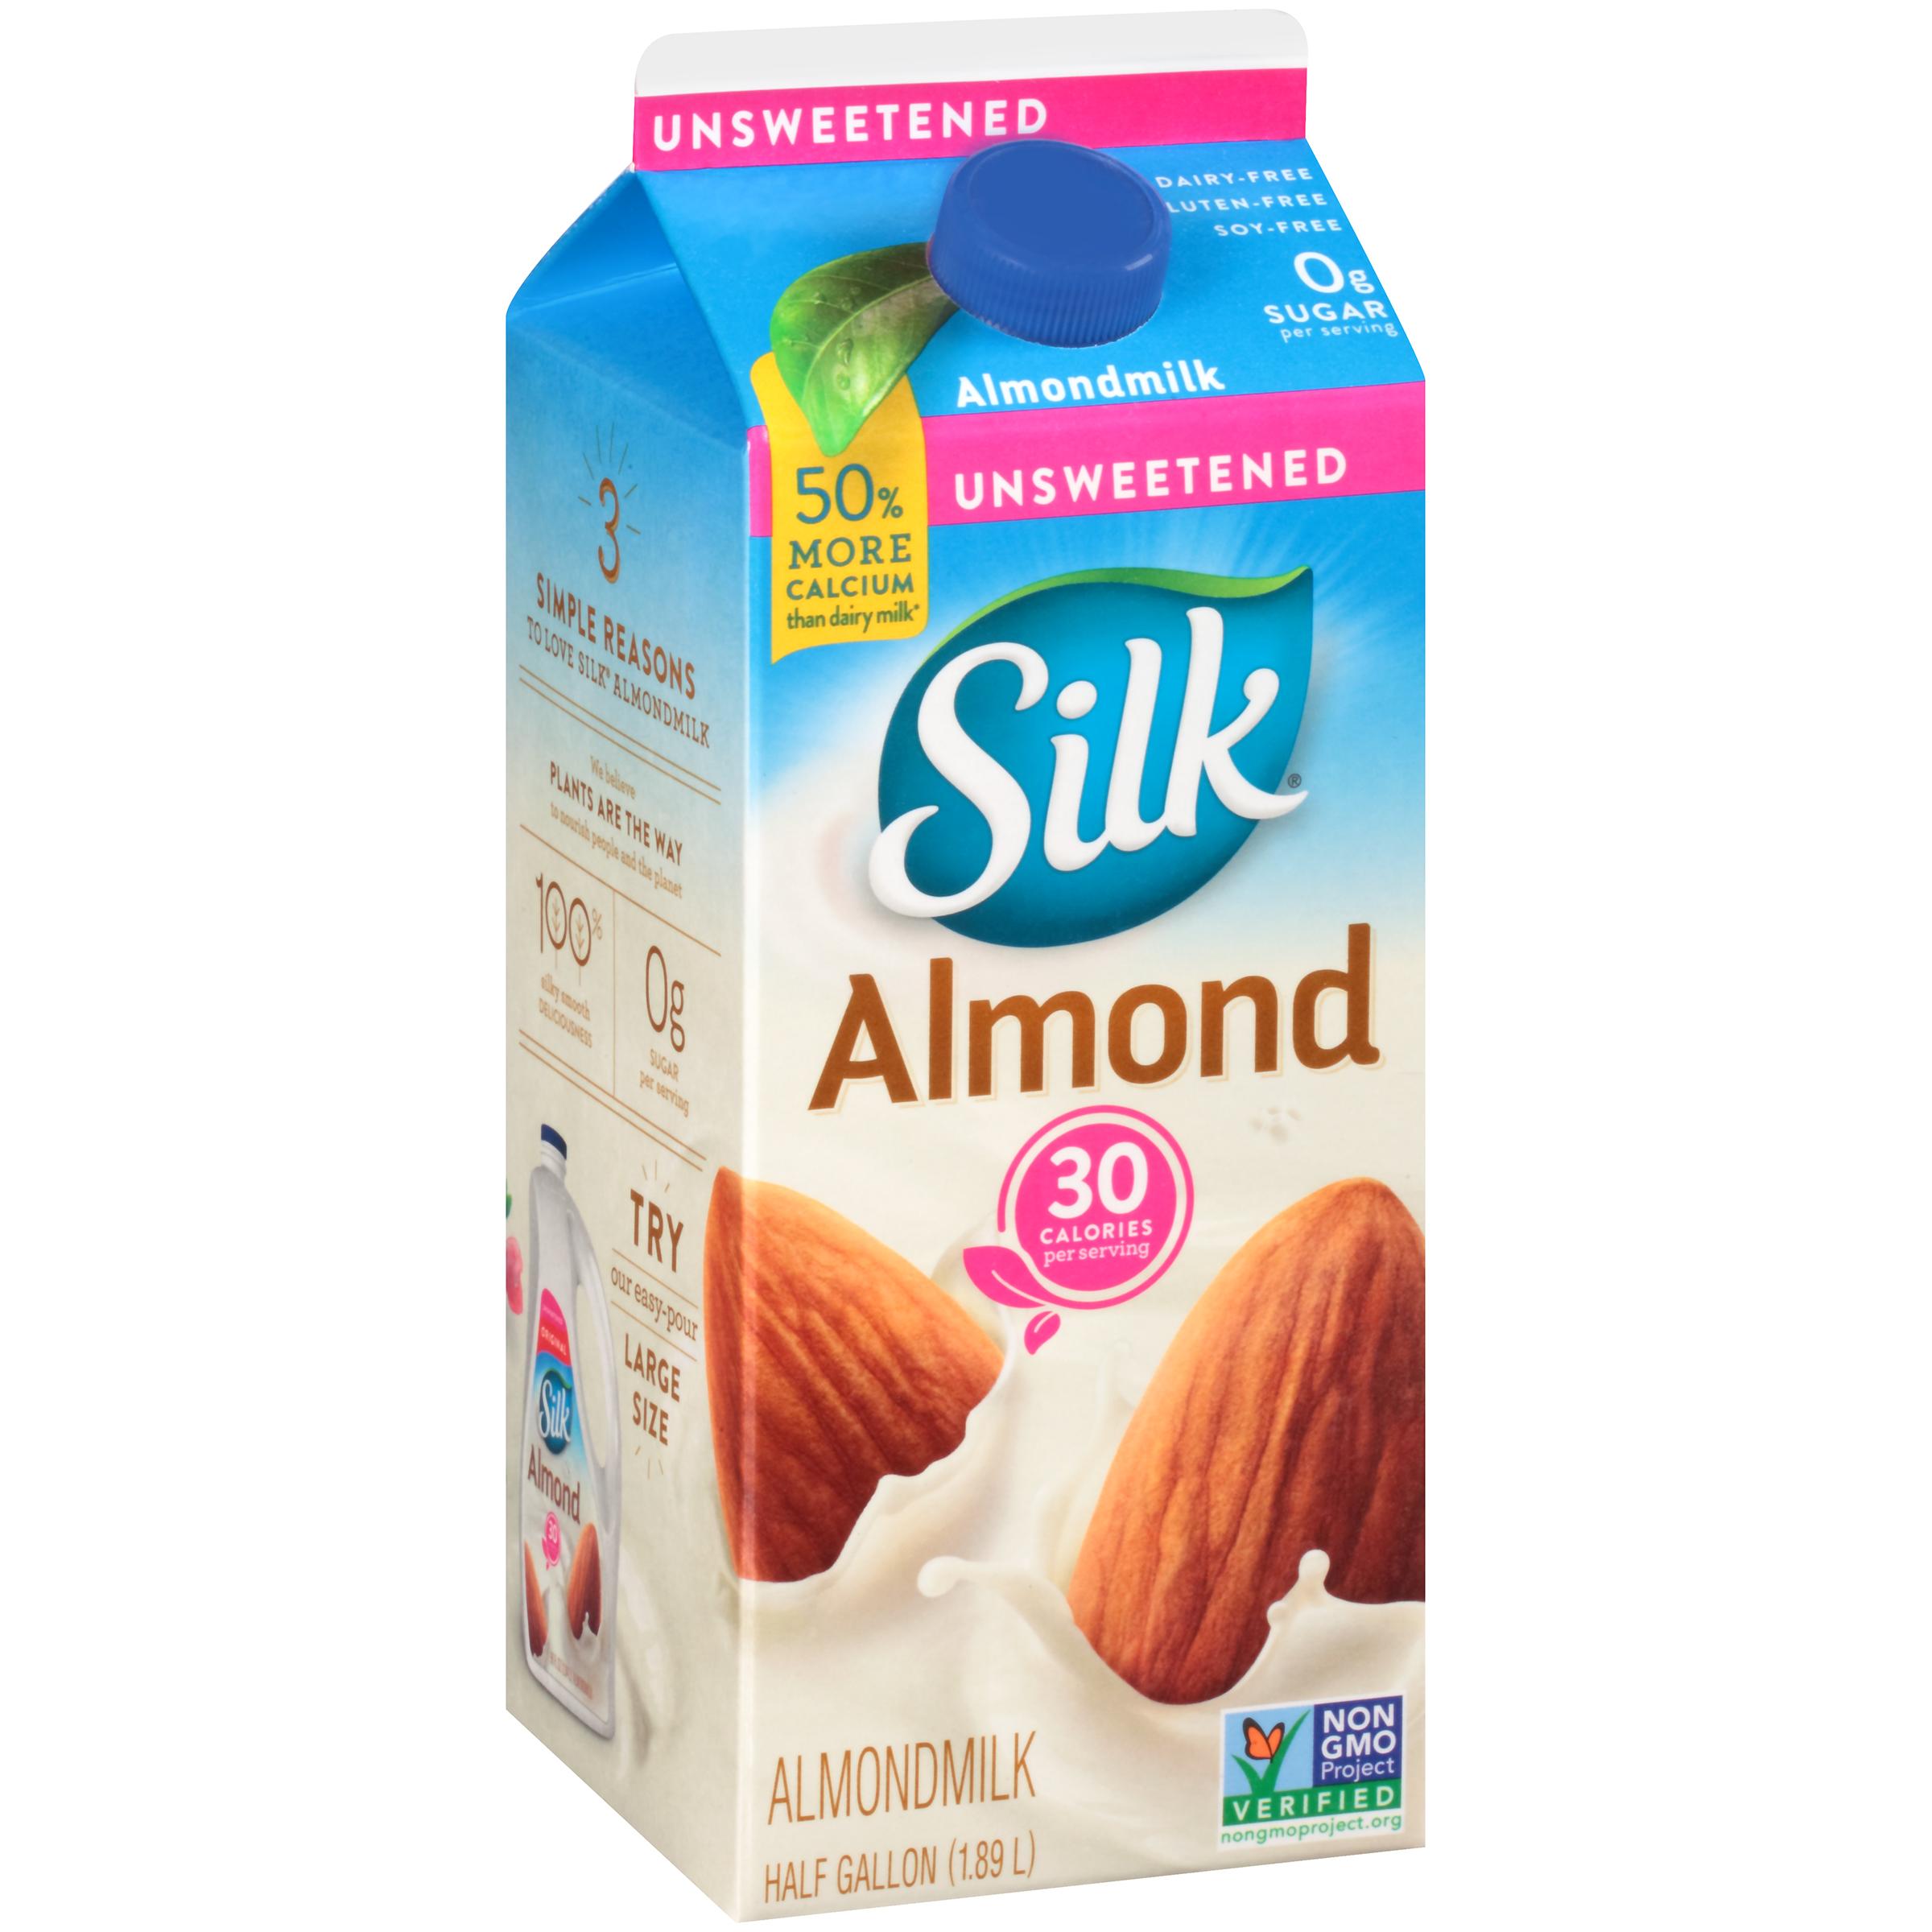 Where to buy unsweetened almond milk